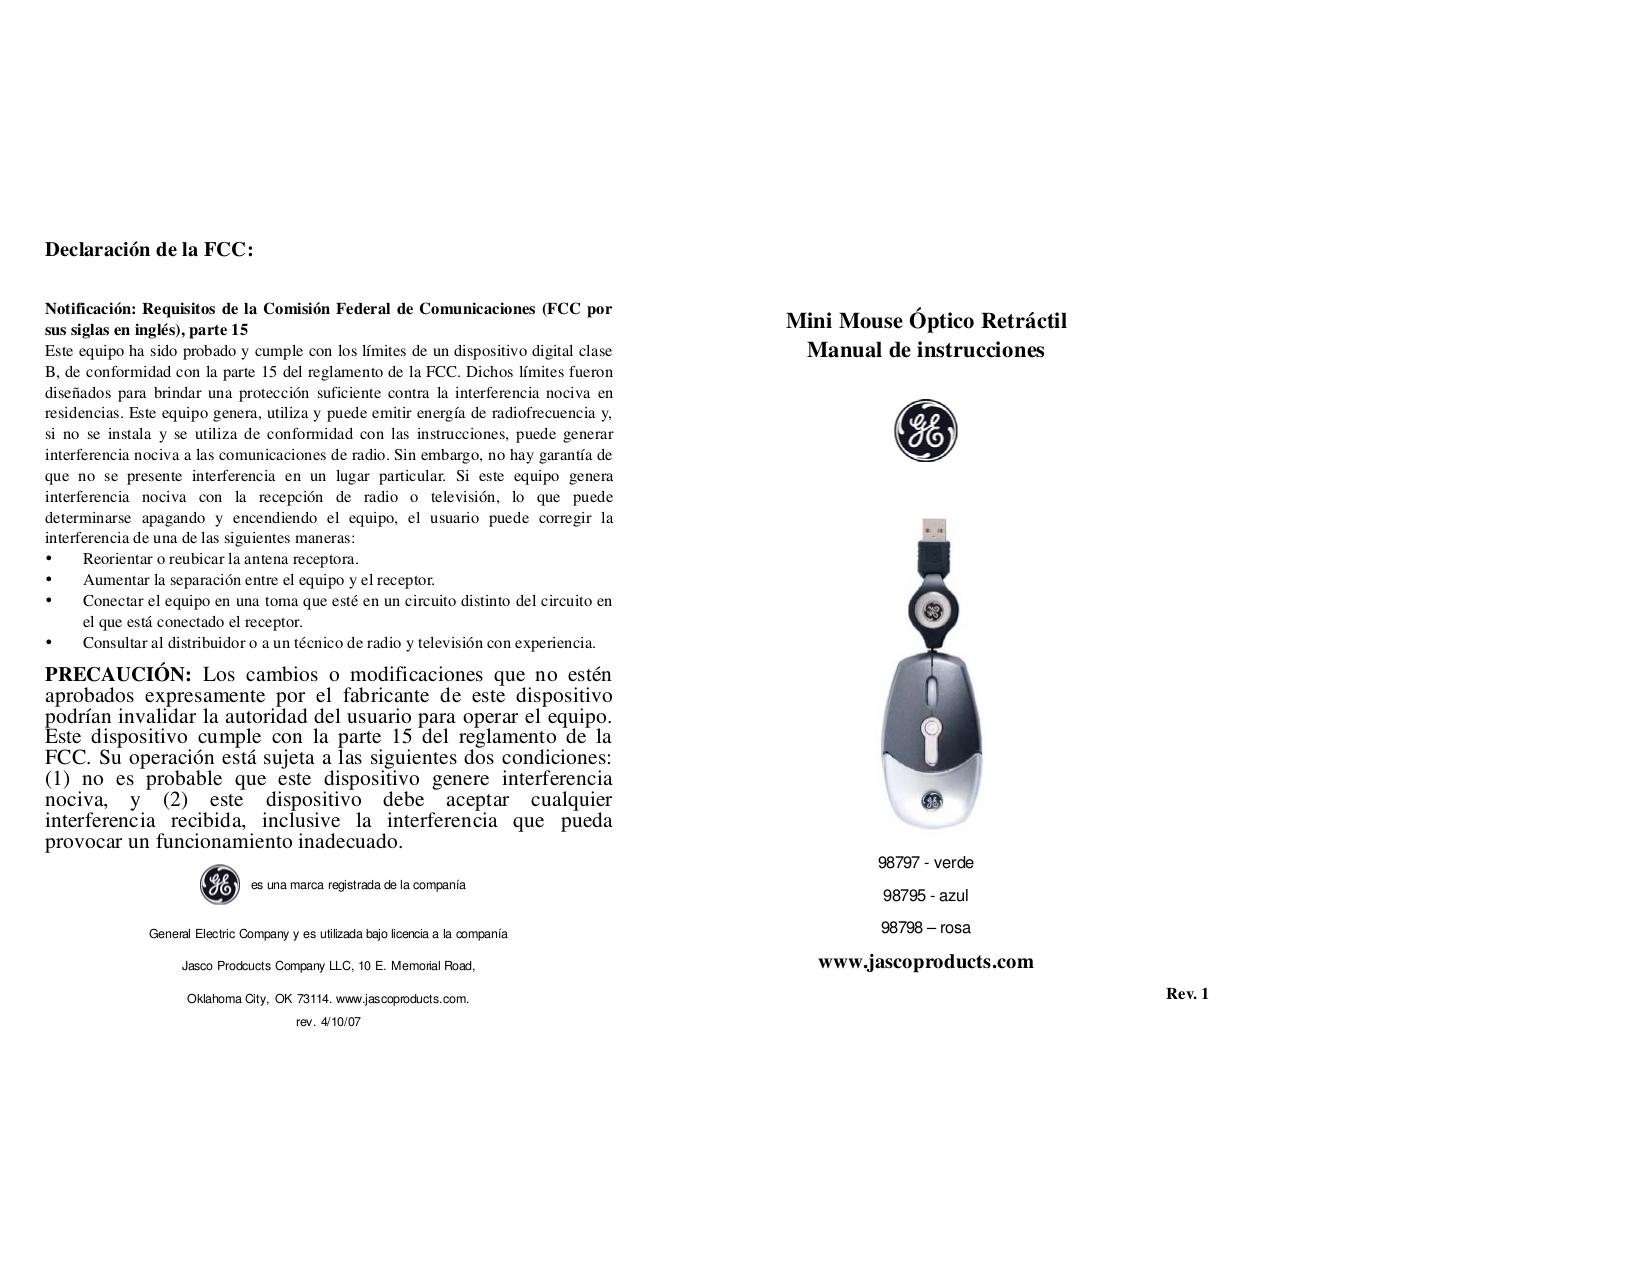 pdf for Jasco Mouse 98795 manual